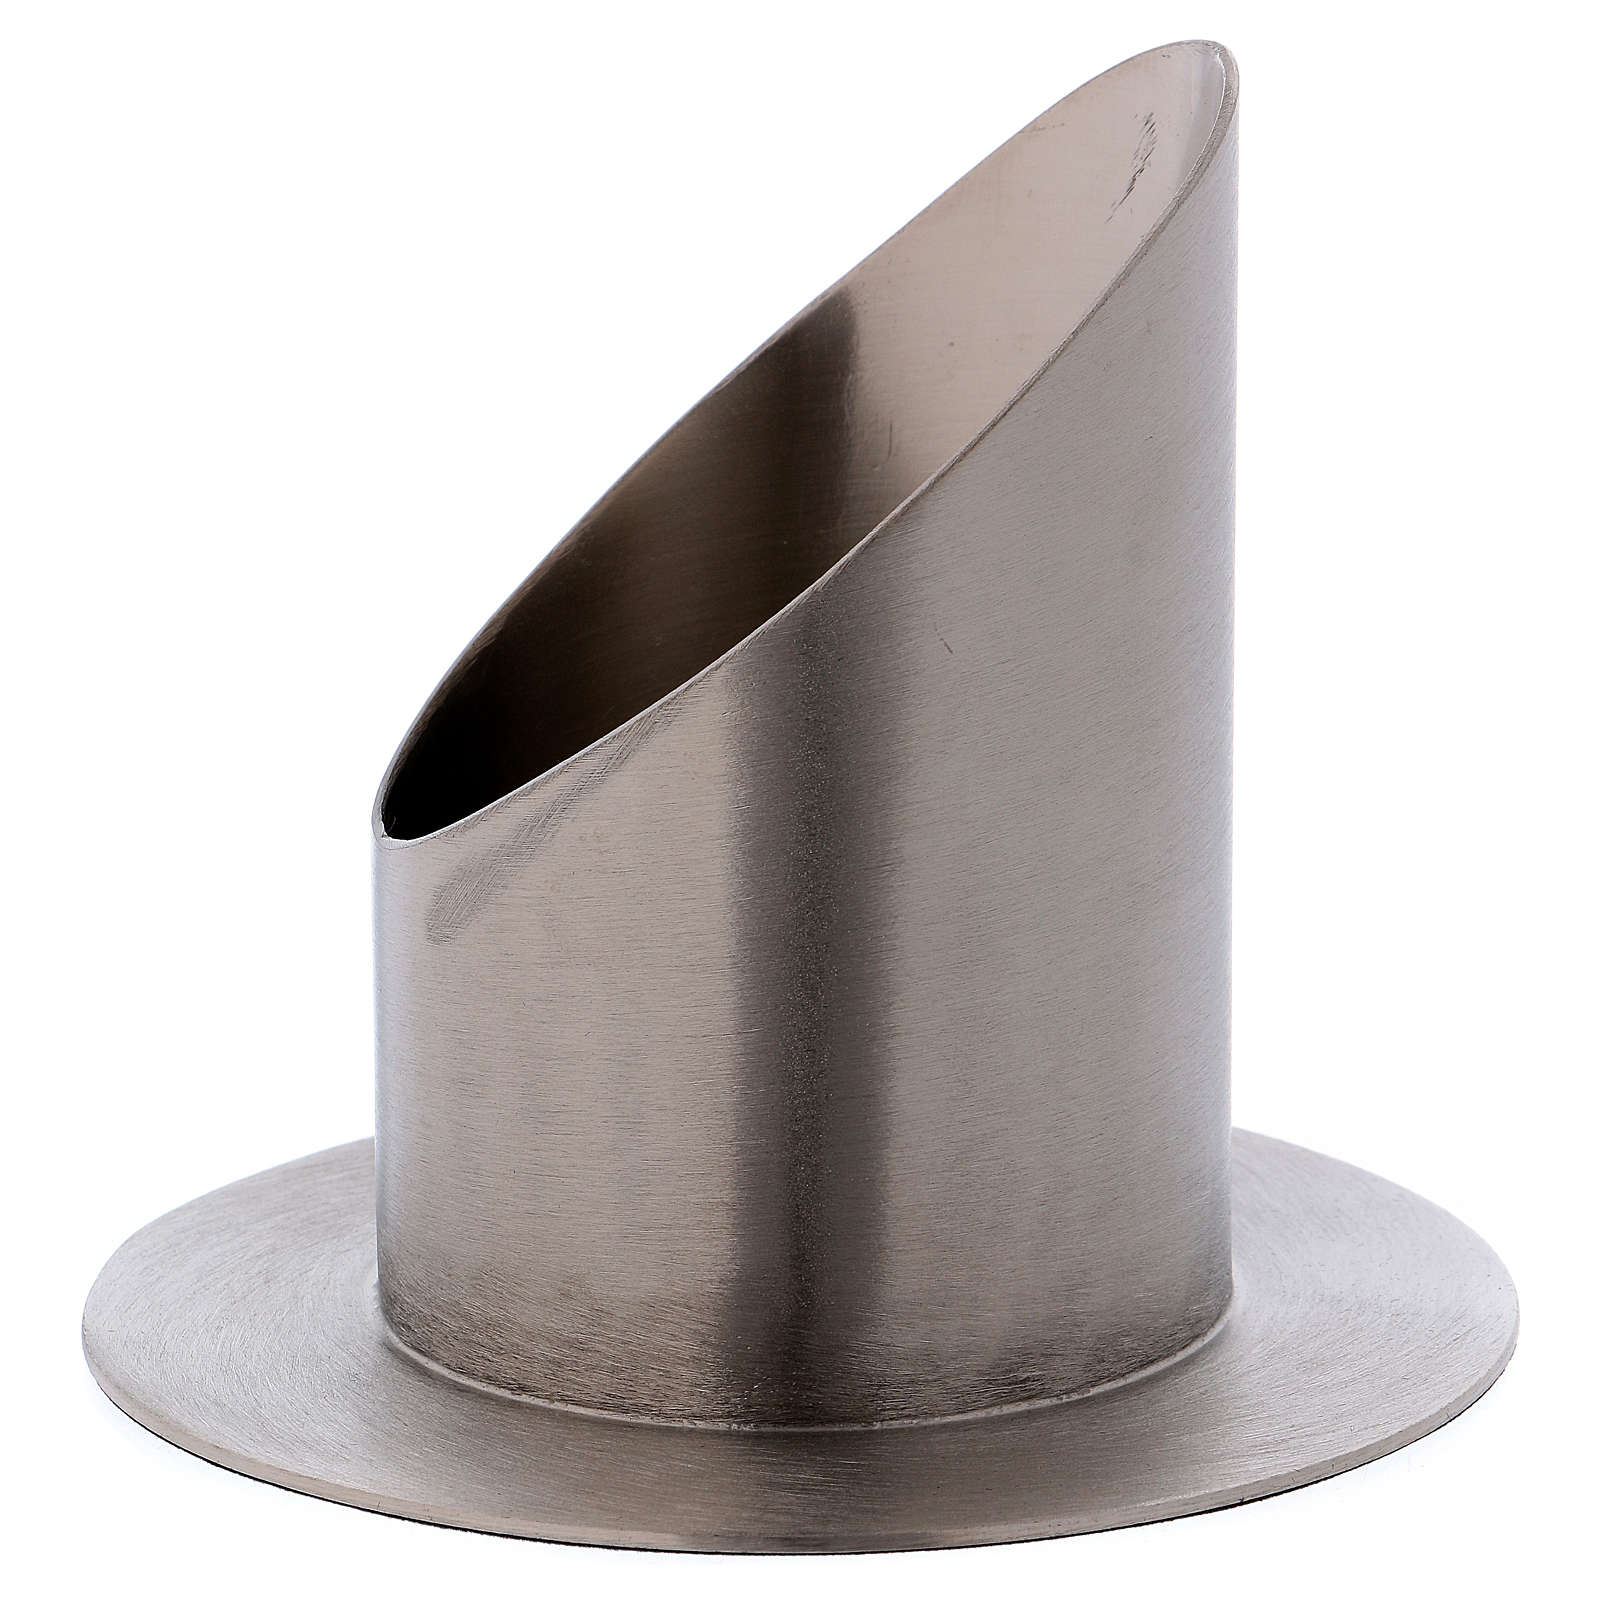 Portacero tubolare ottone argentato opaco diametro 7 cm 4